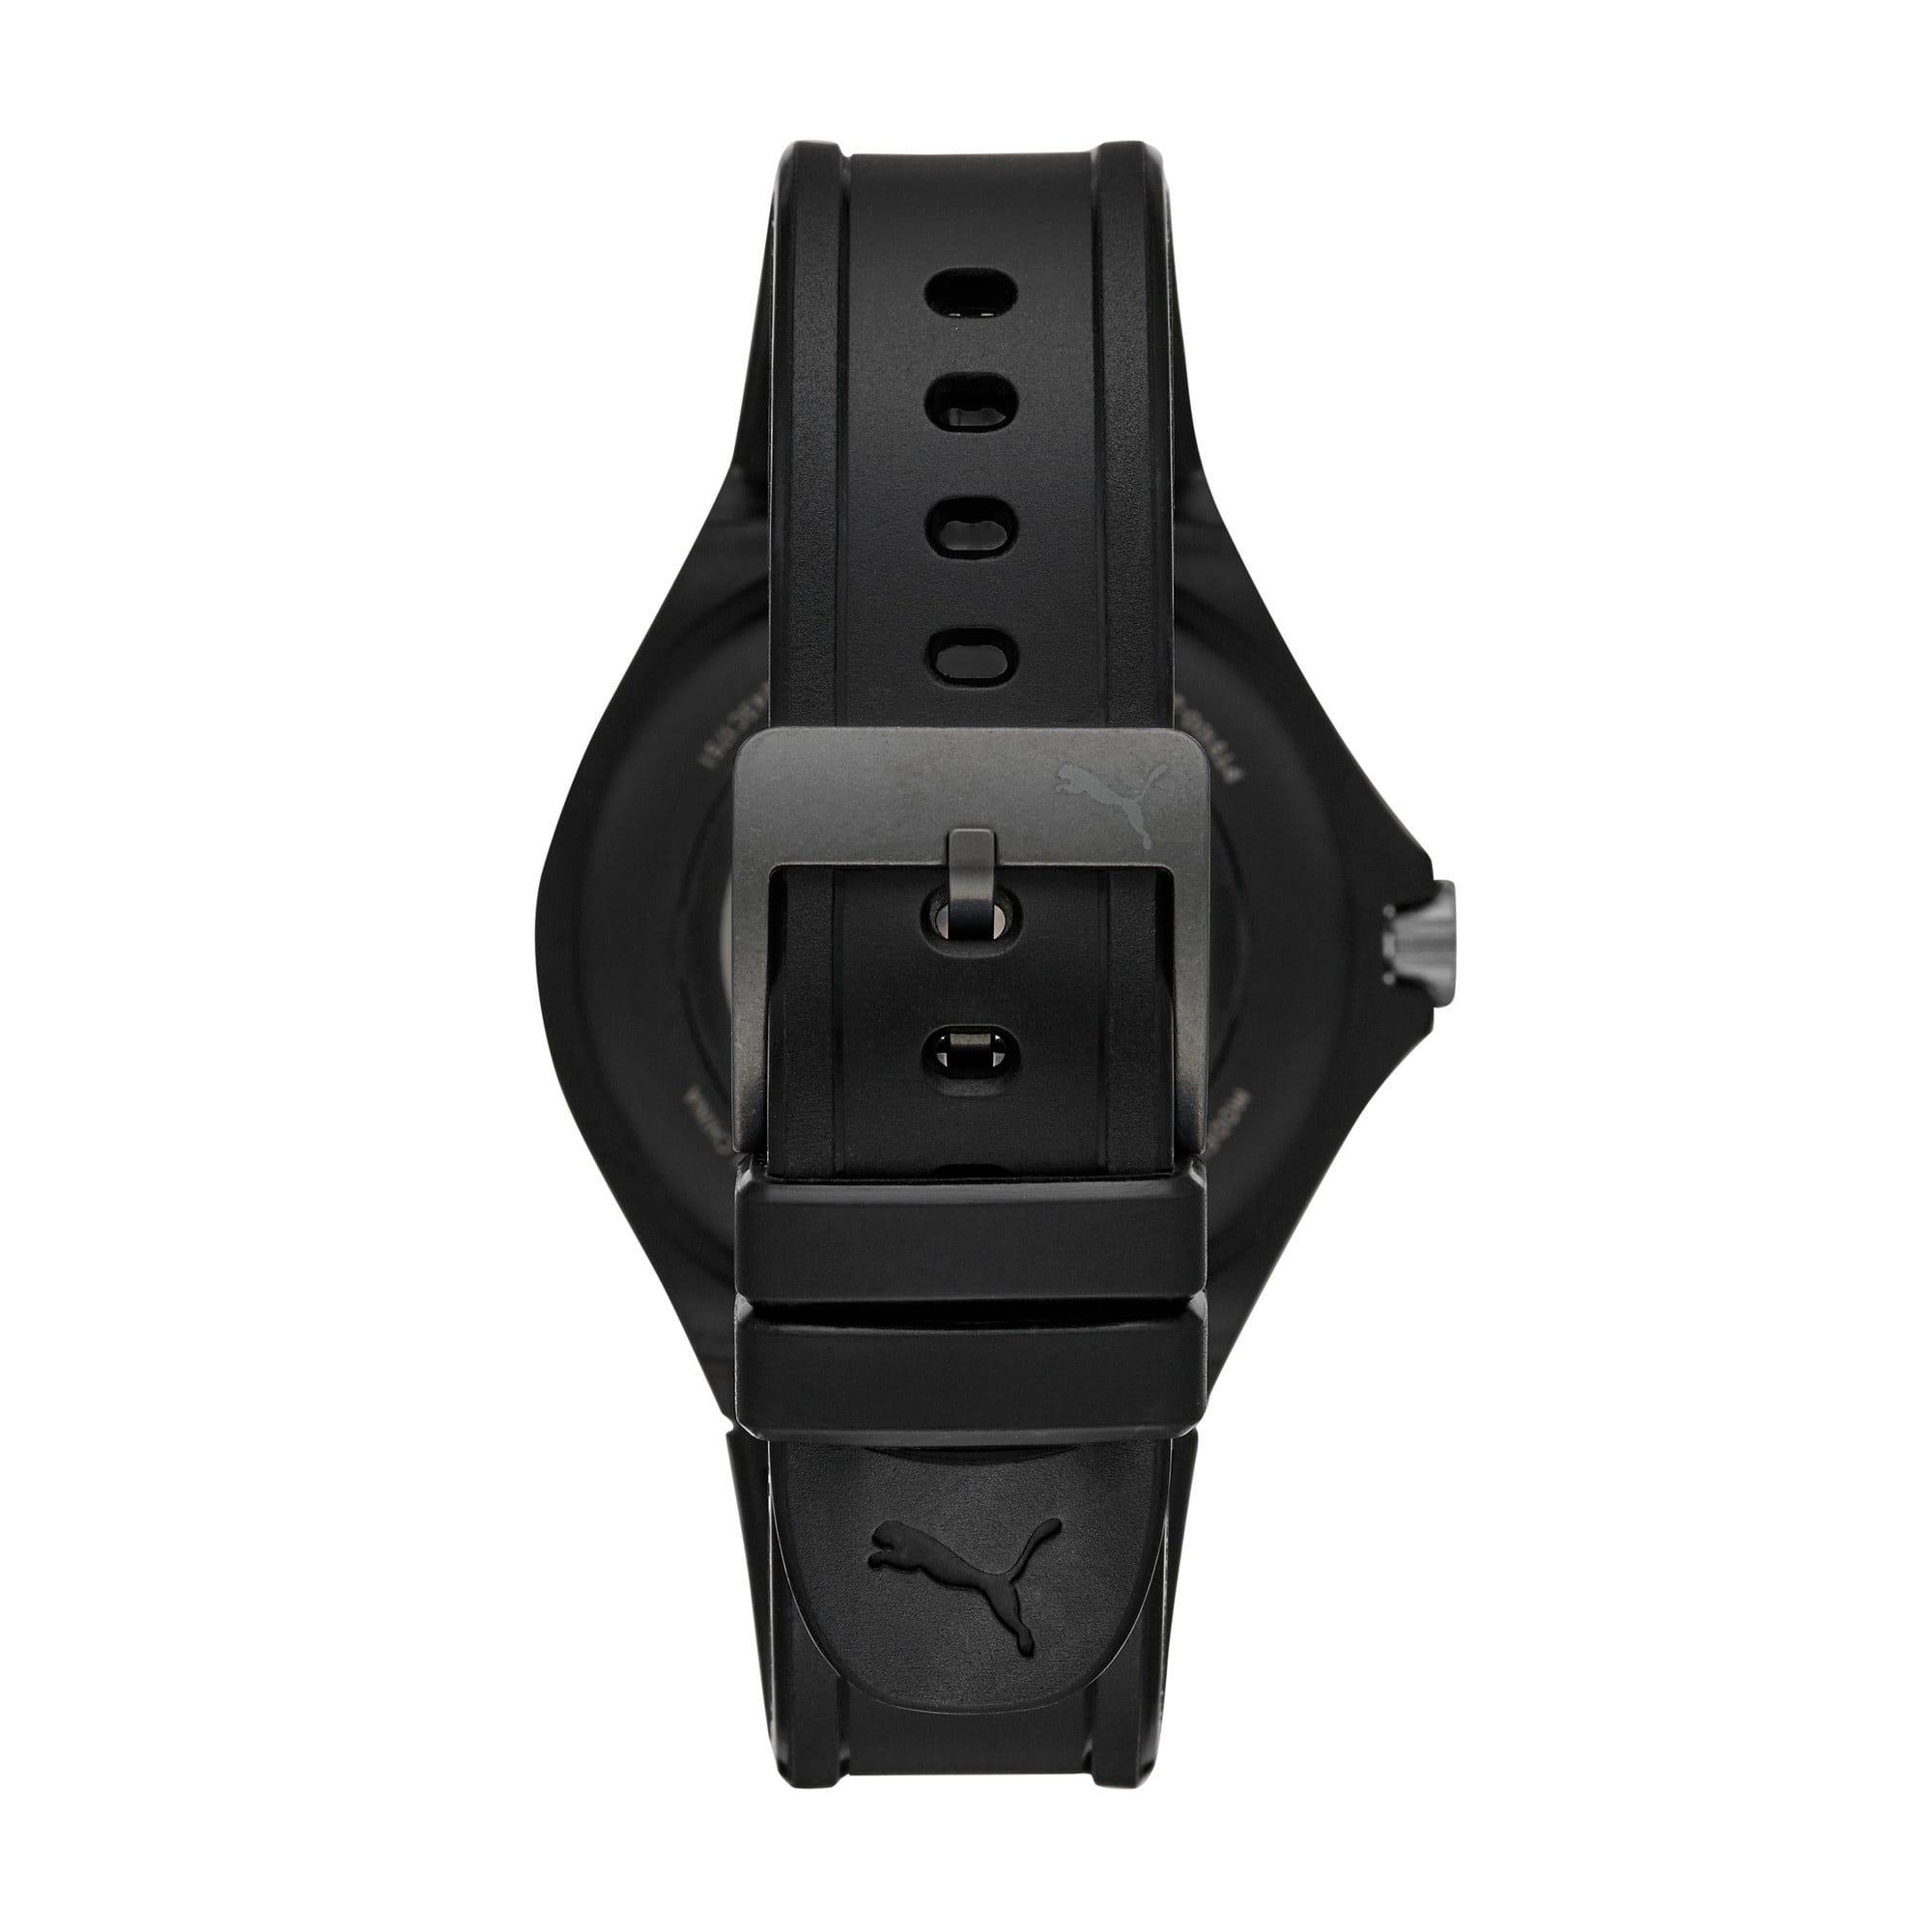 Thumbnail 2 of PUMA Smartwatch, Black/Gray, medium